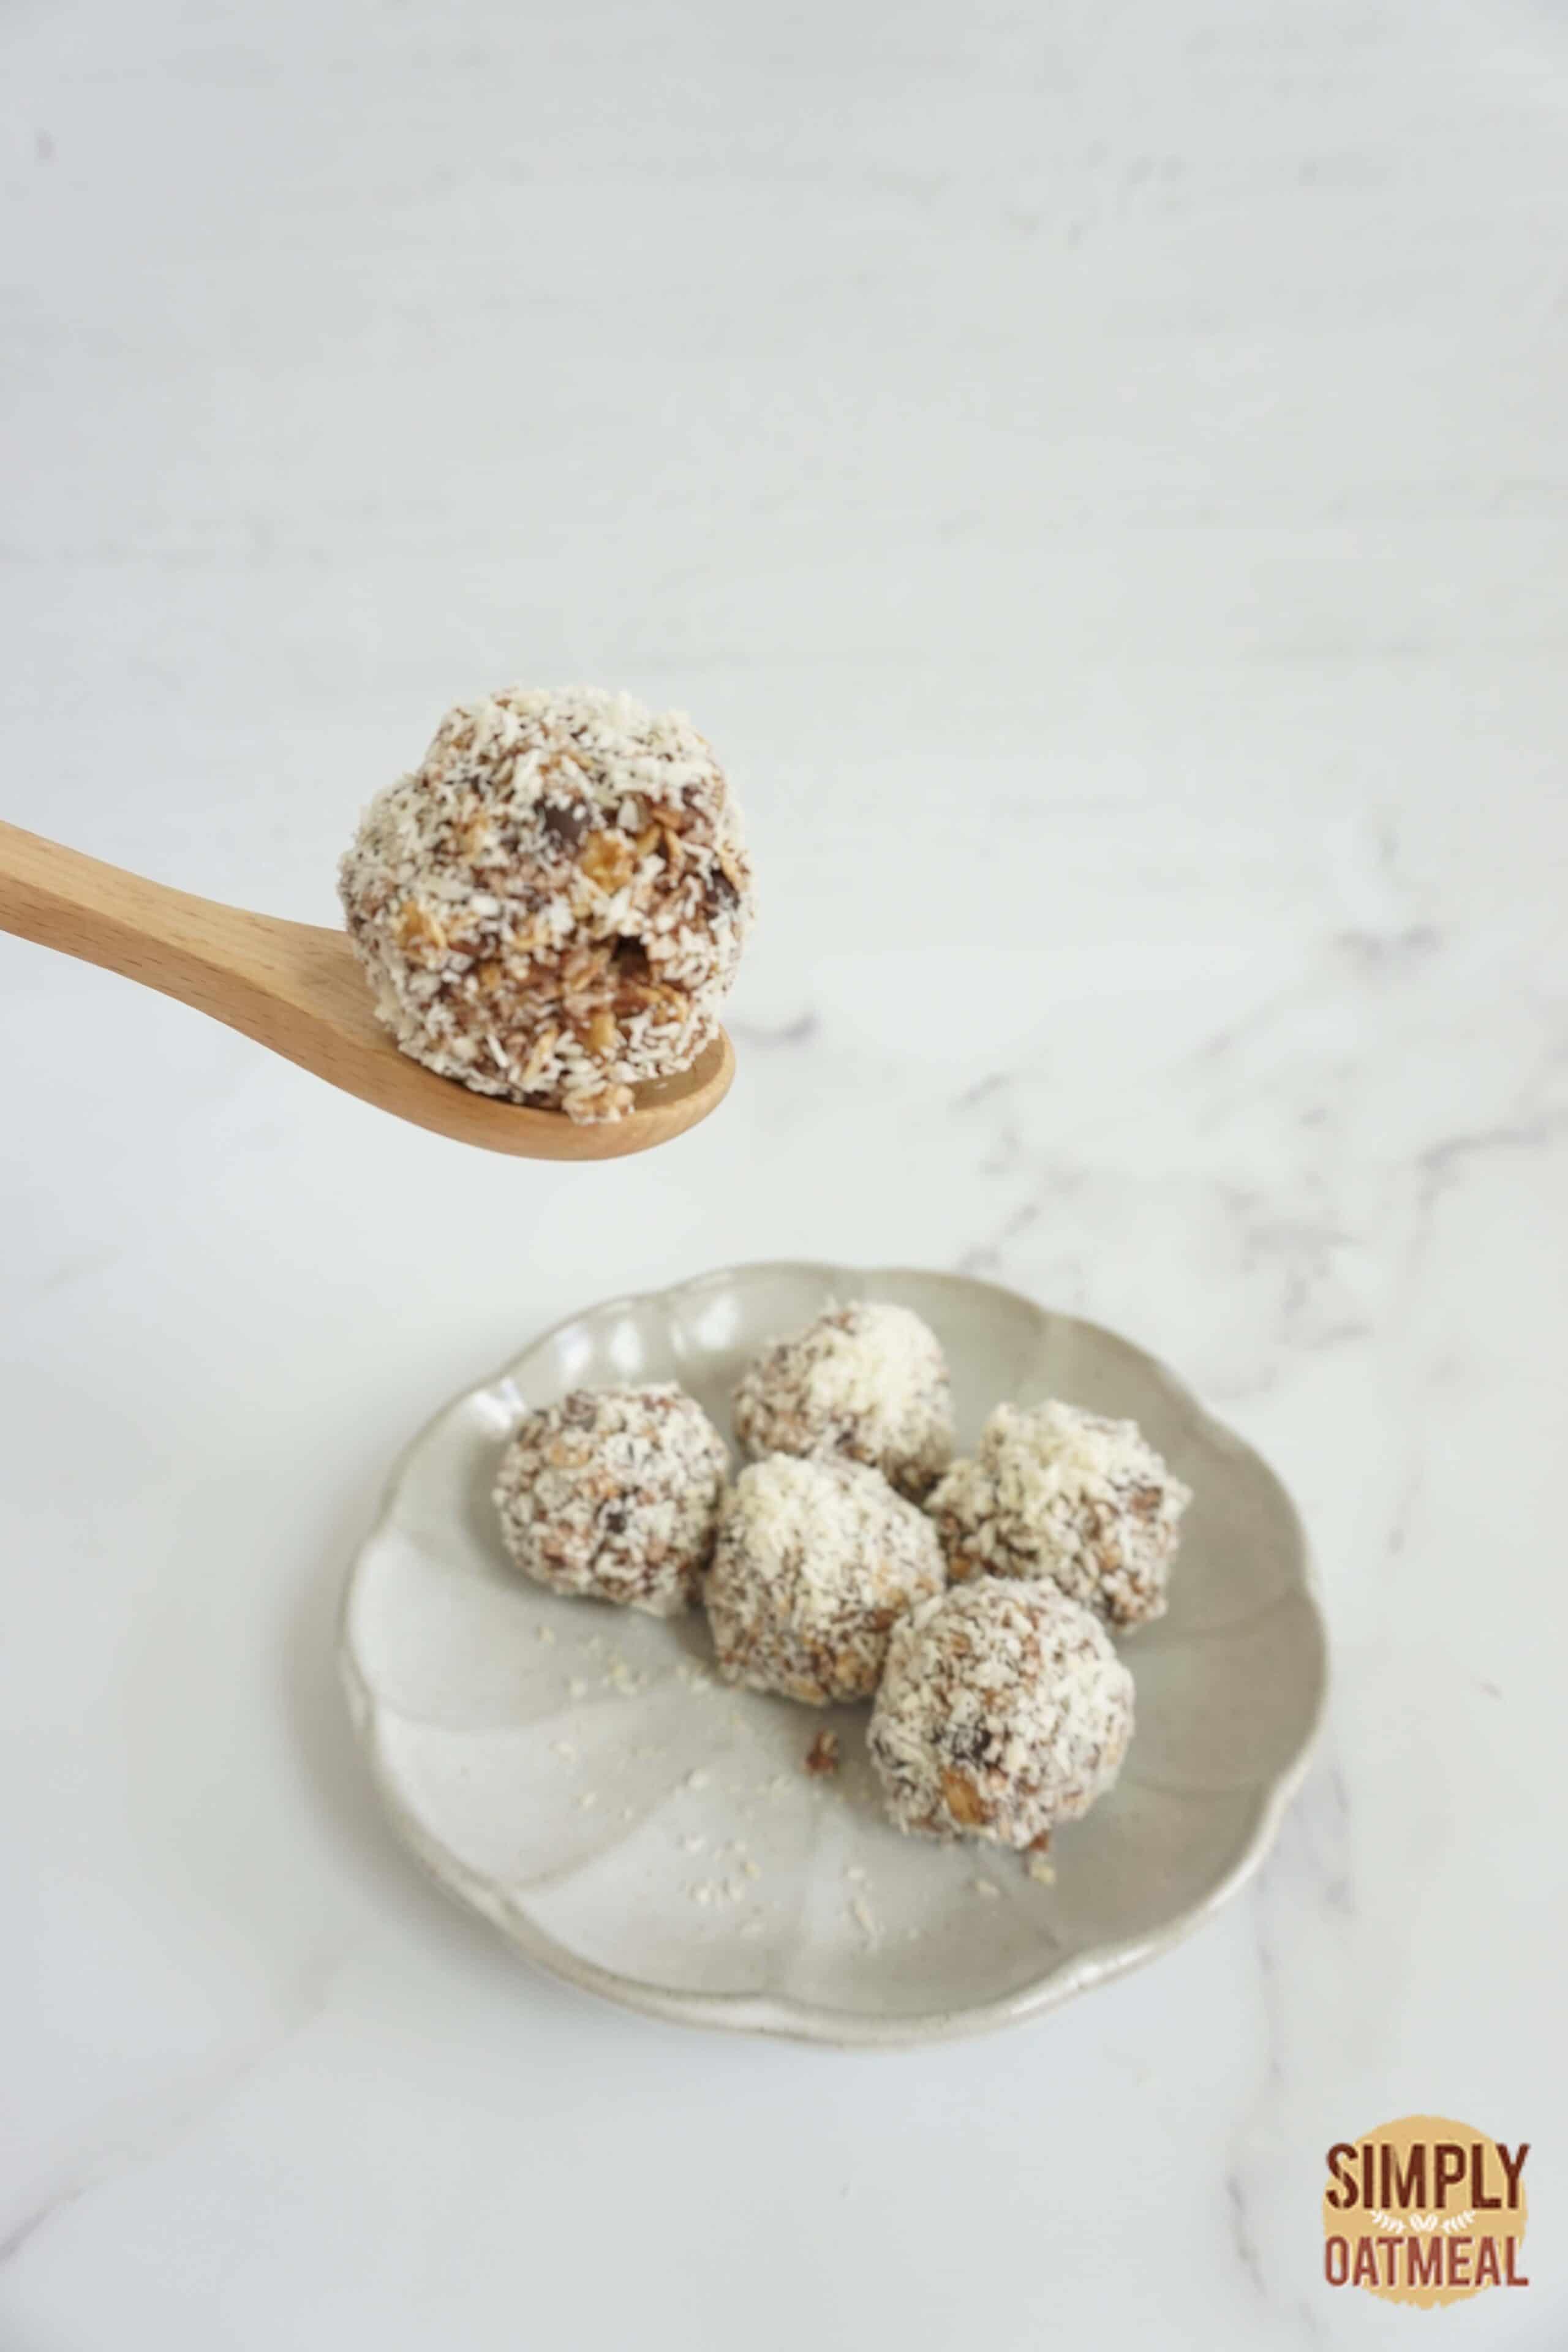 No bake almond joy oatmeal ball on a wooden spoon.